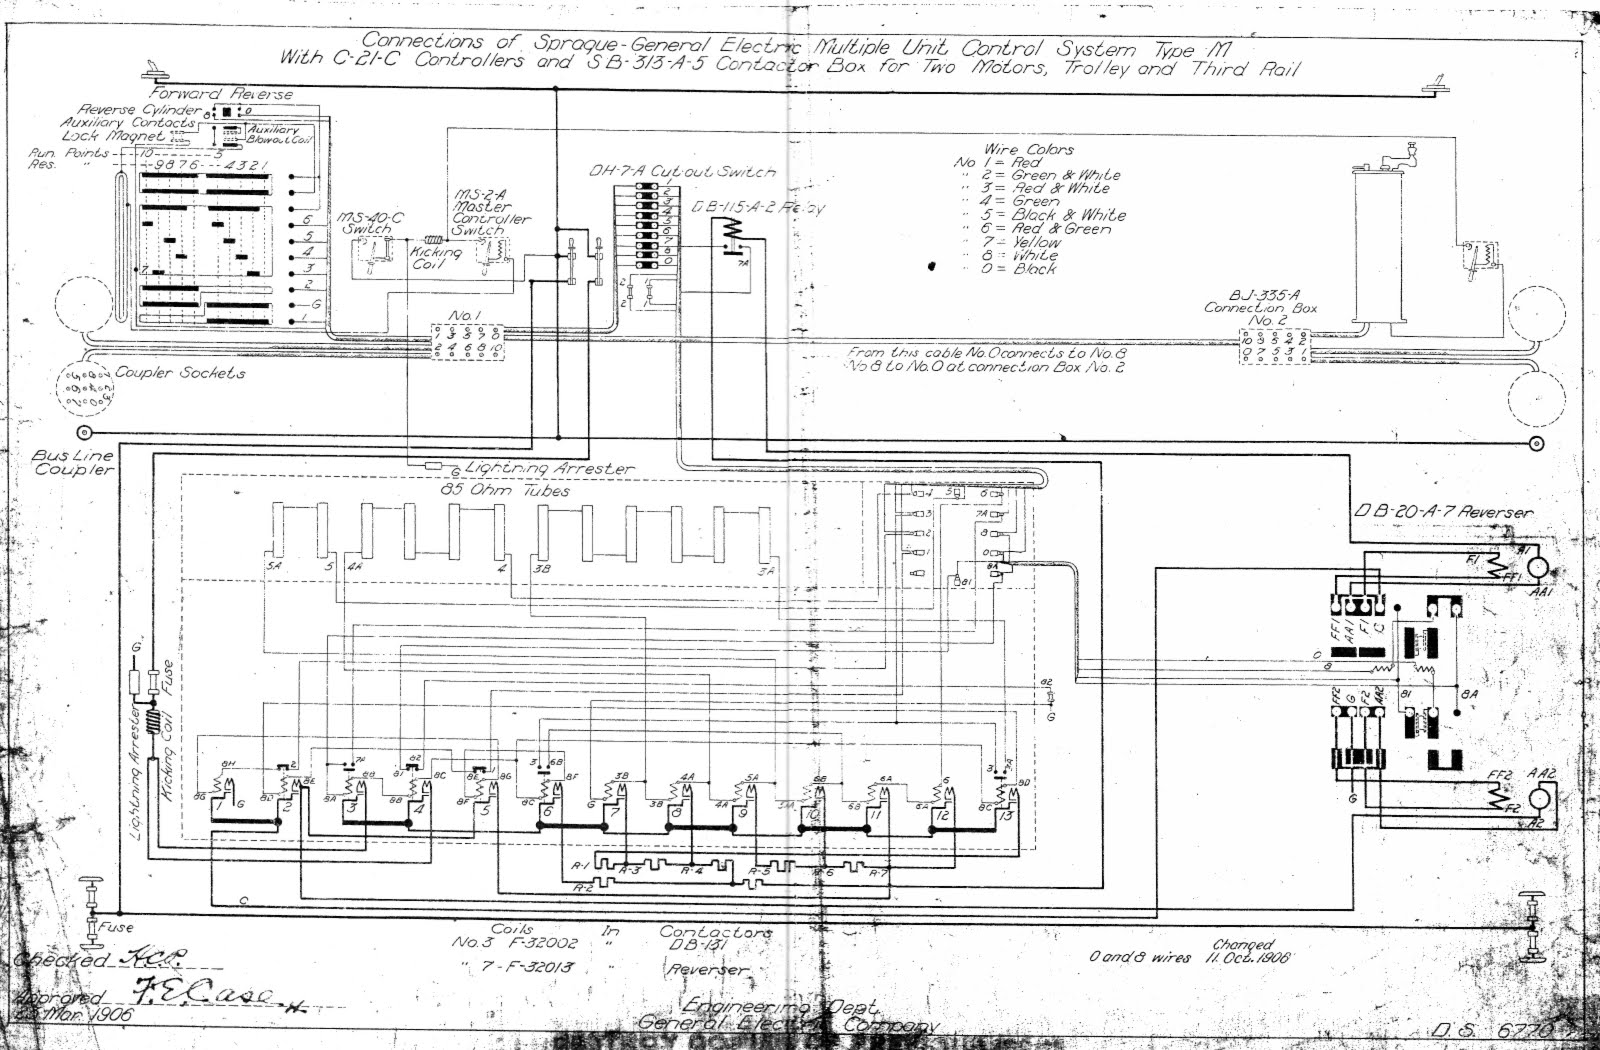 97 Geo Tracker Wiring Diagram Base